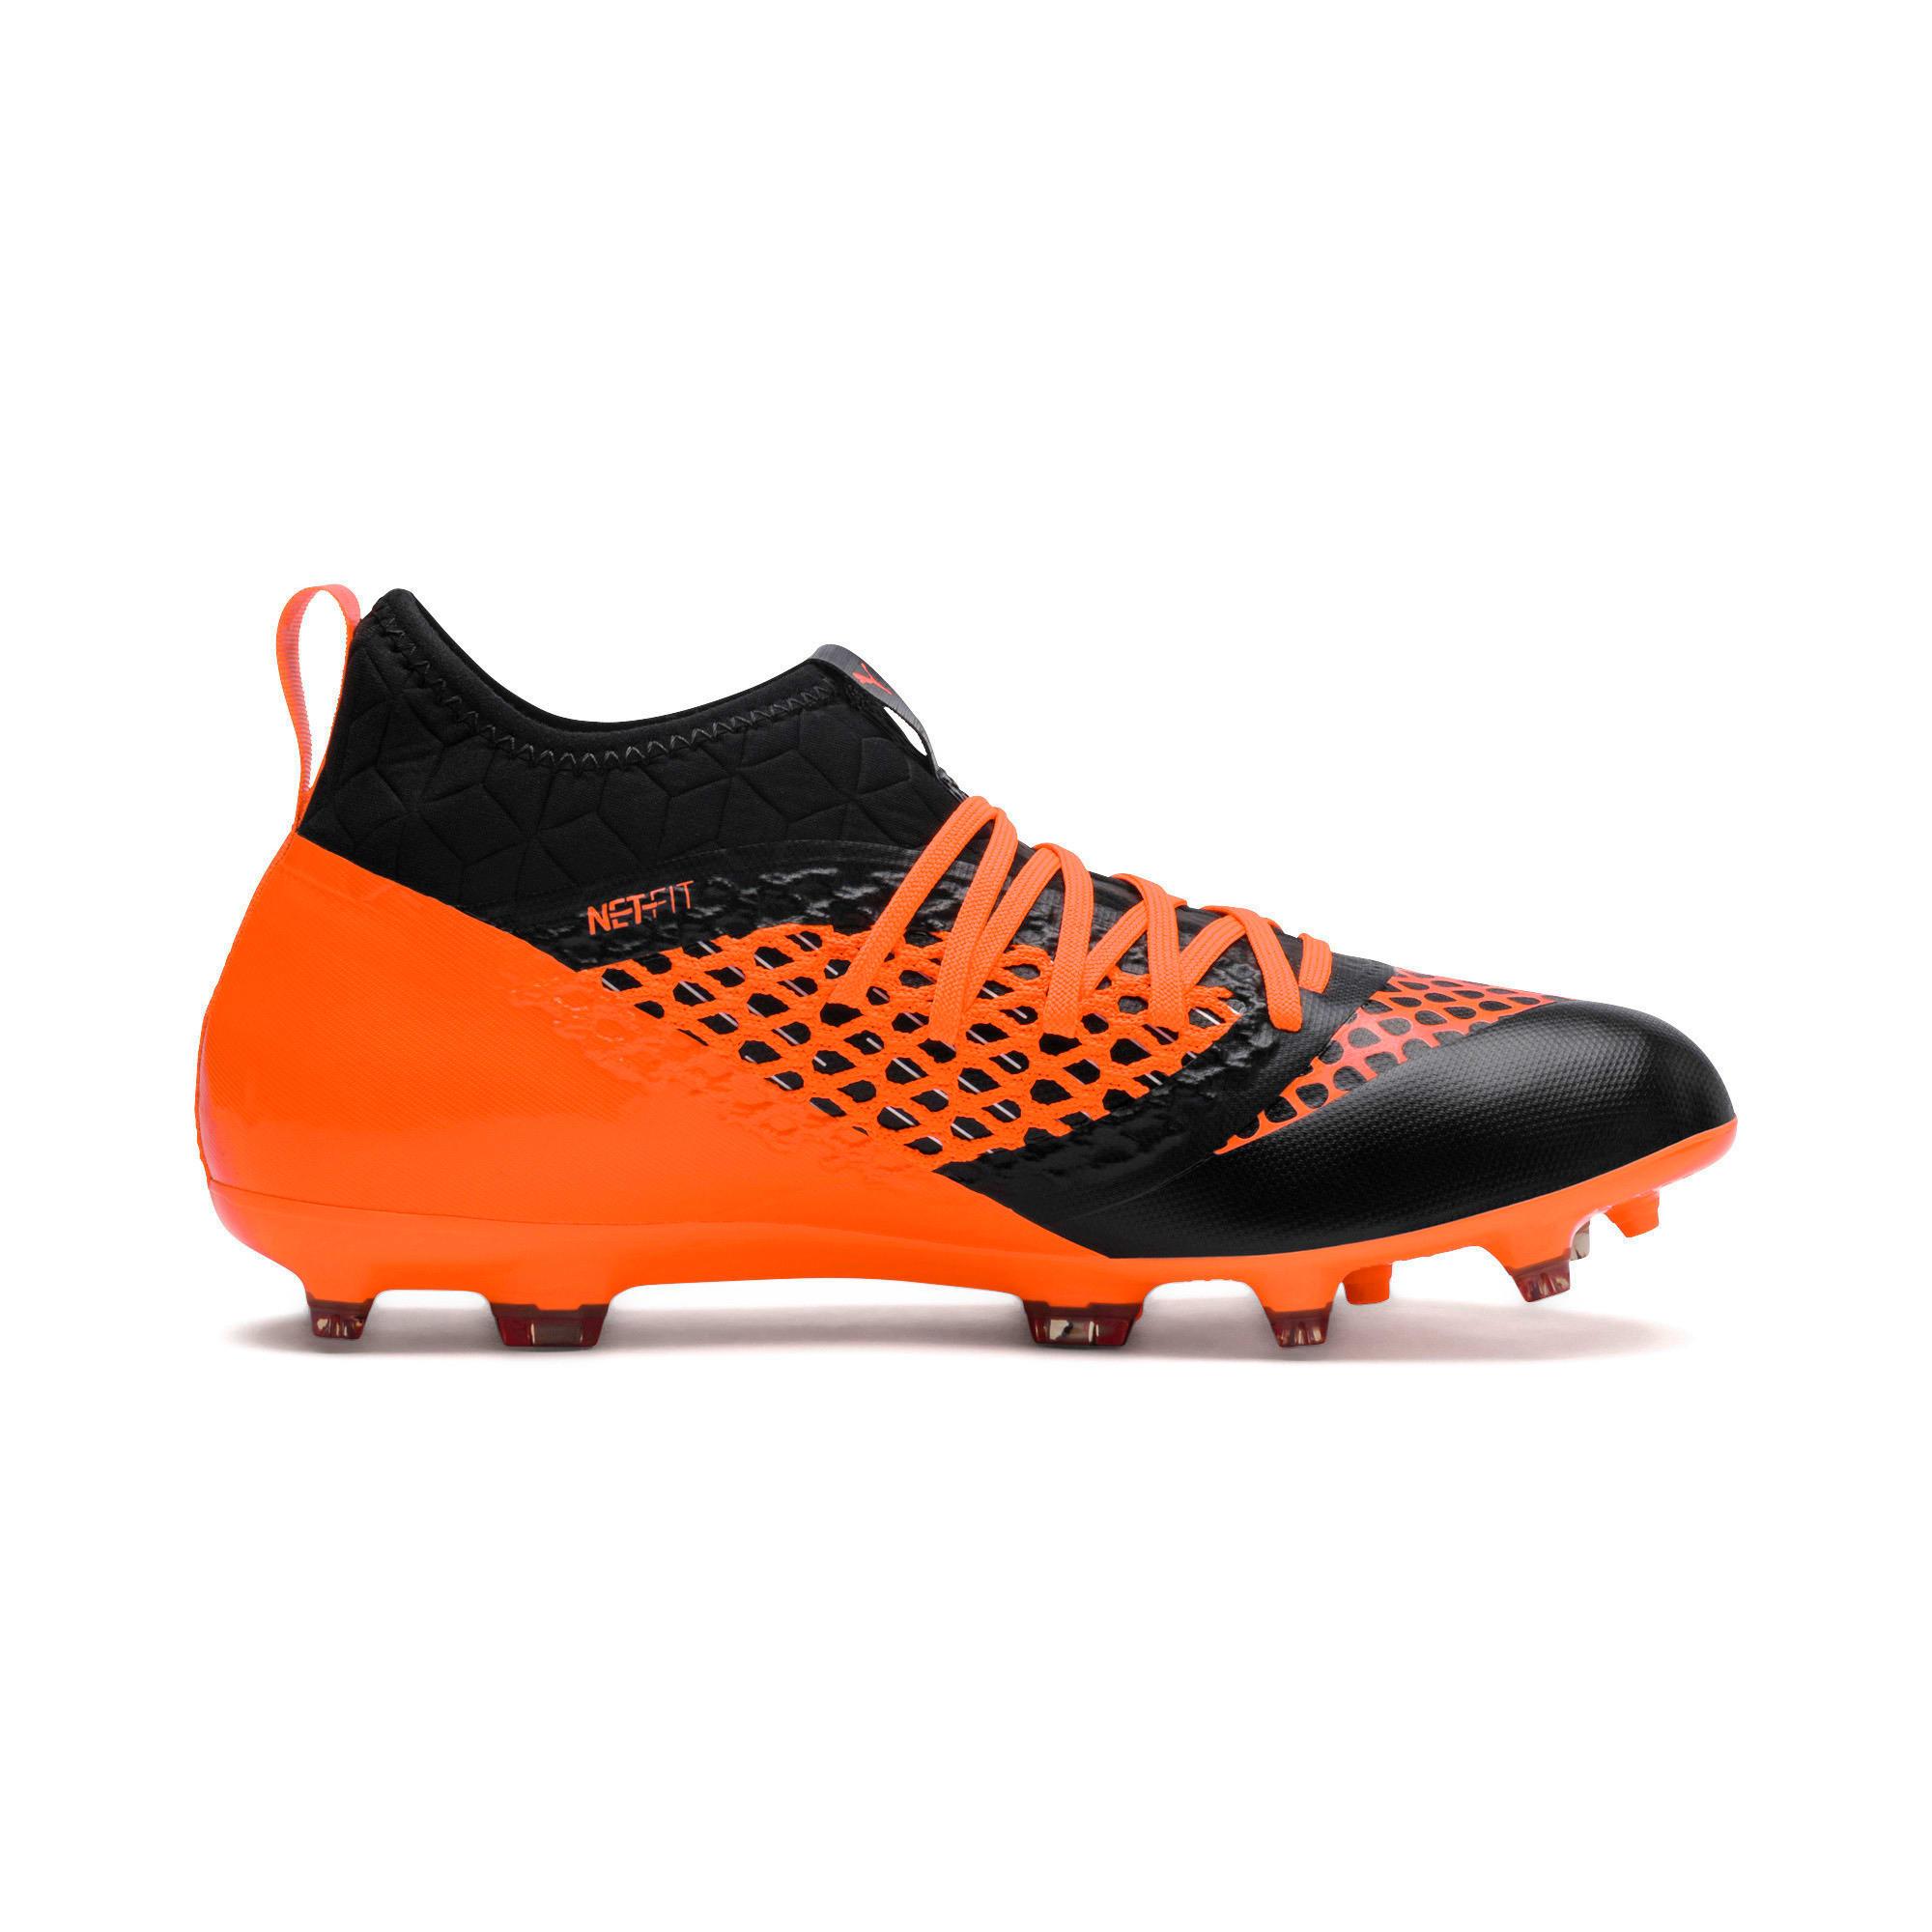 Thumbnail 3 of FUTURE 2.3 NETFIT FG/AG  Football Boots, Puma Black-Shocking Orange, medium-IND